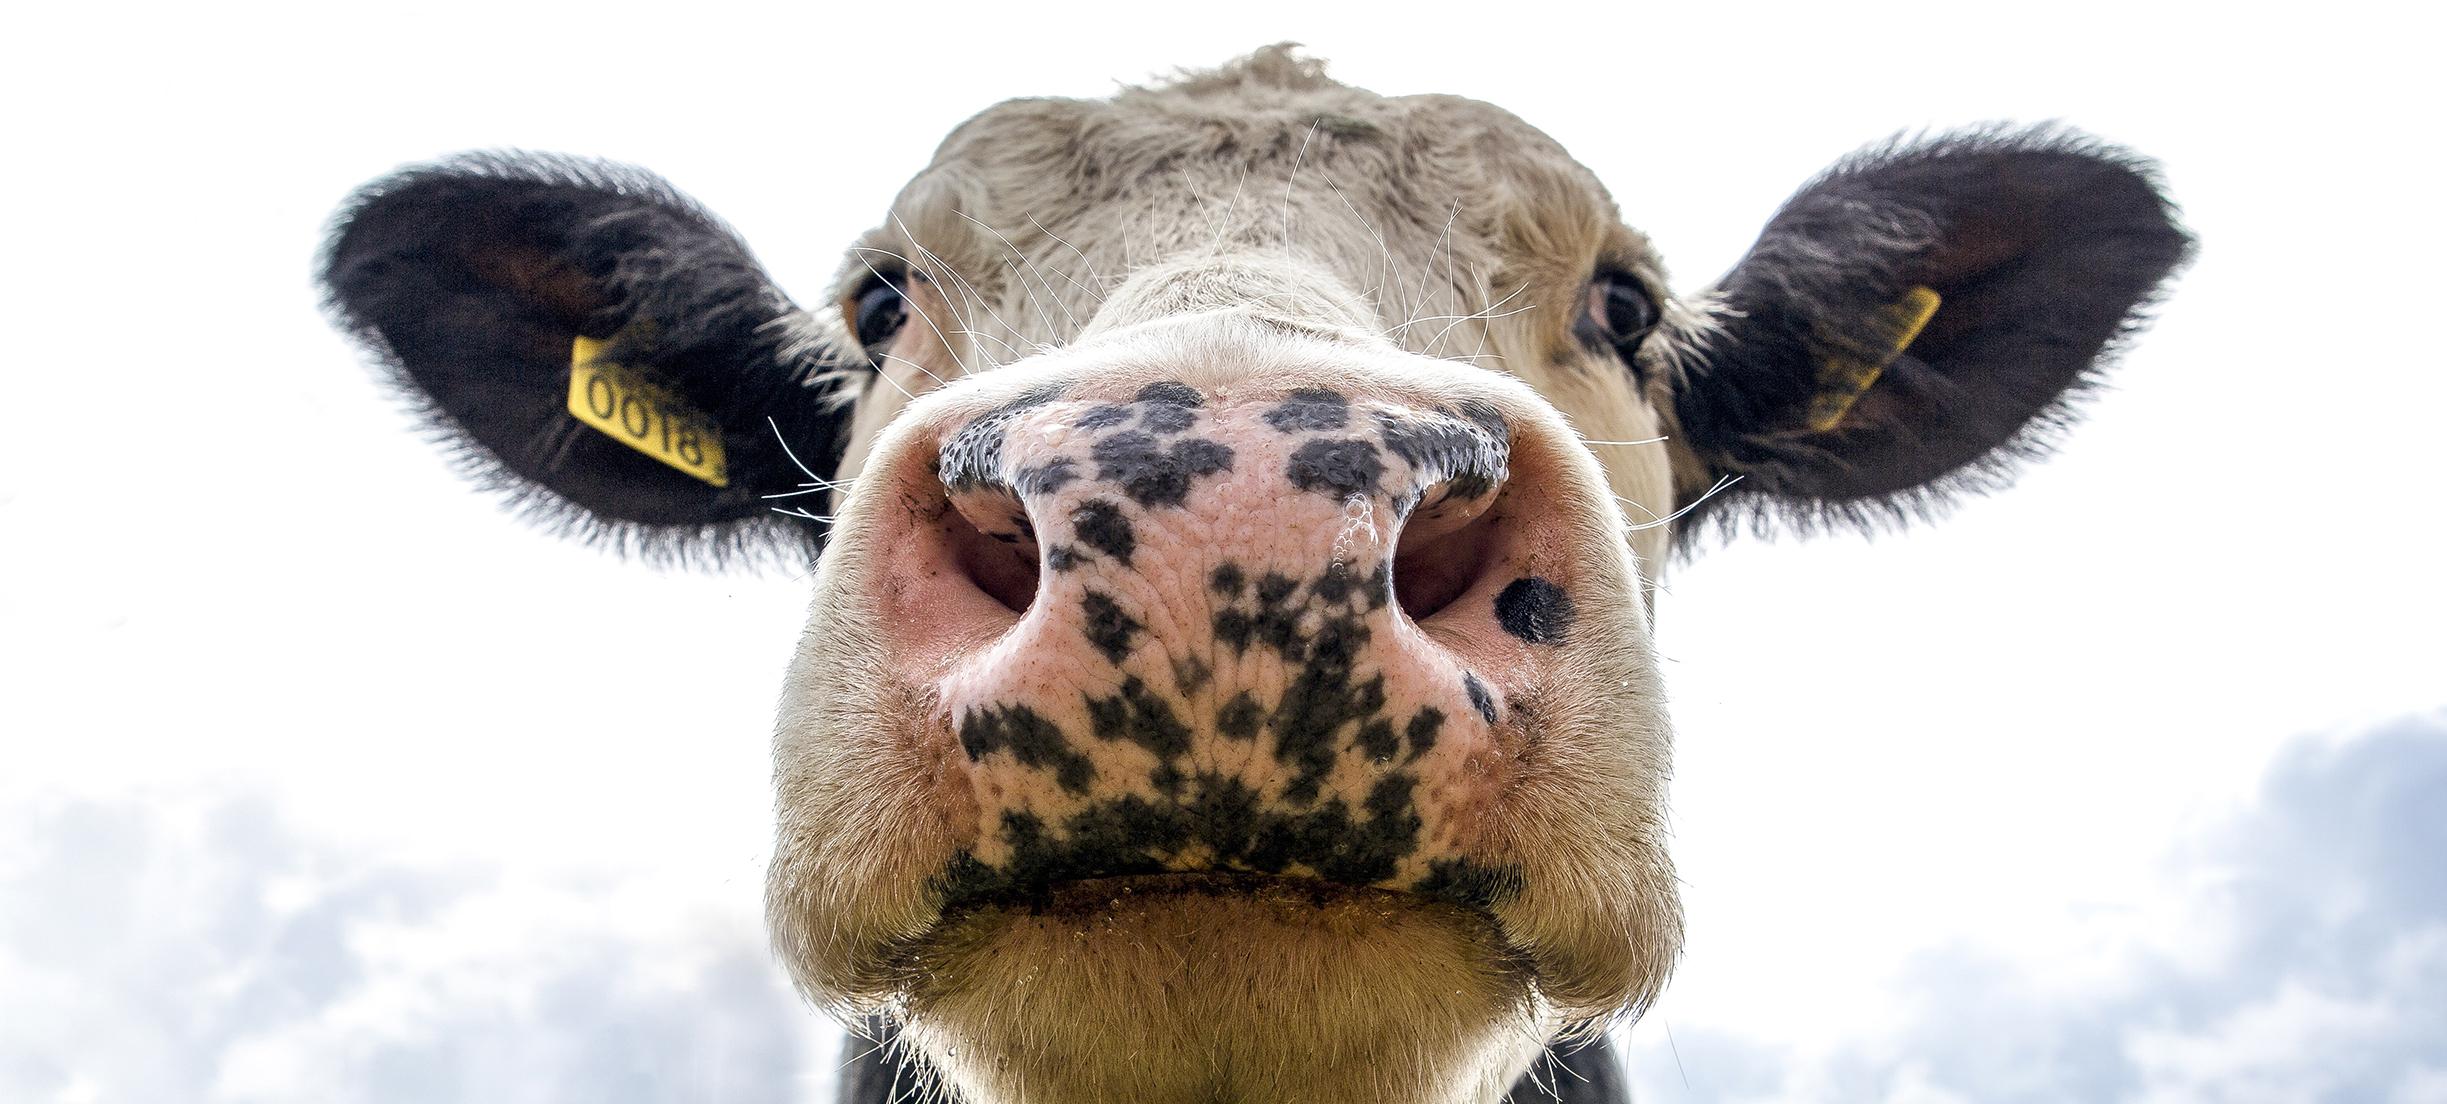 Studie: 'Kweekvlees veel minder belastend voor milieu dan vlees van dieren', en meer nieuws